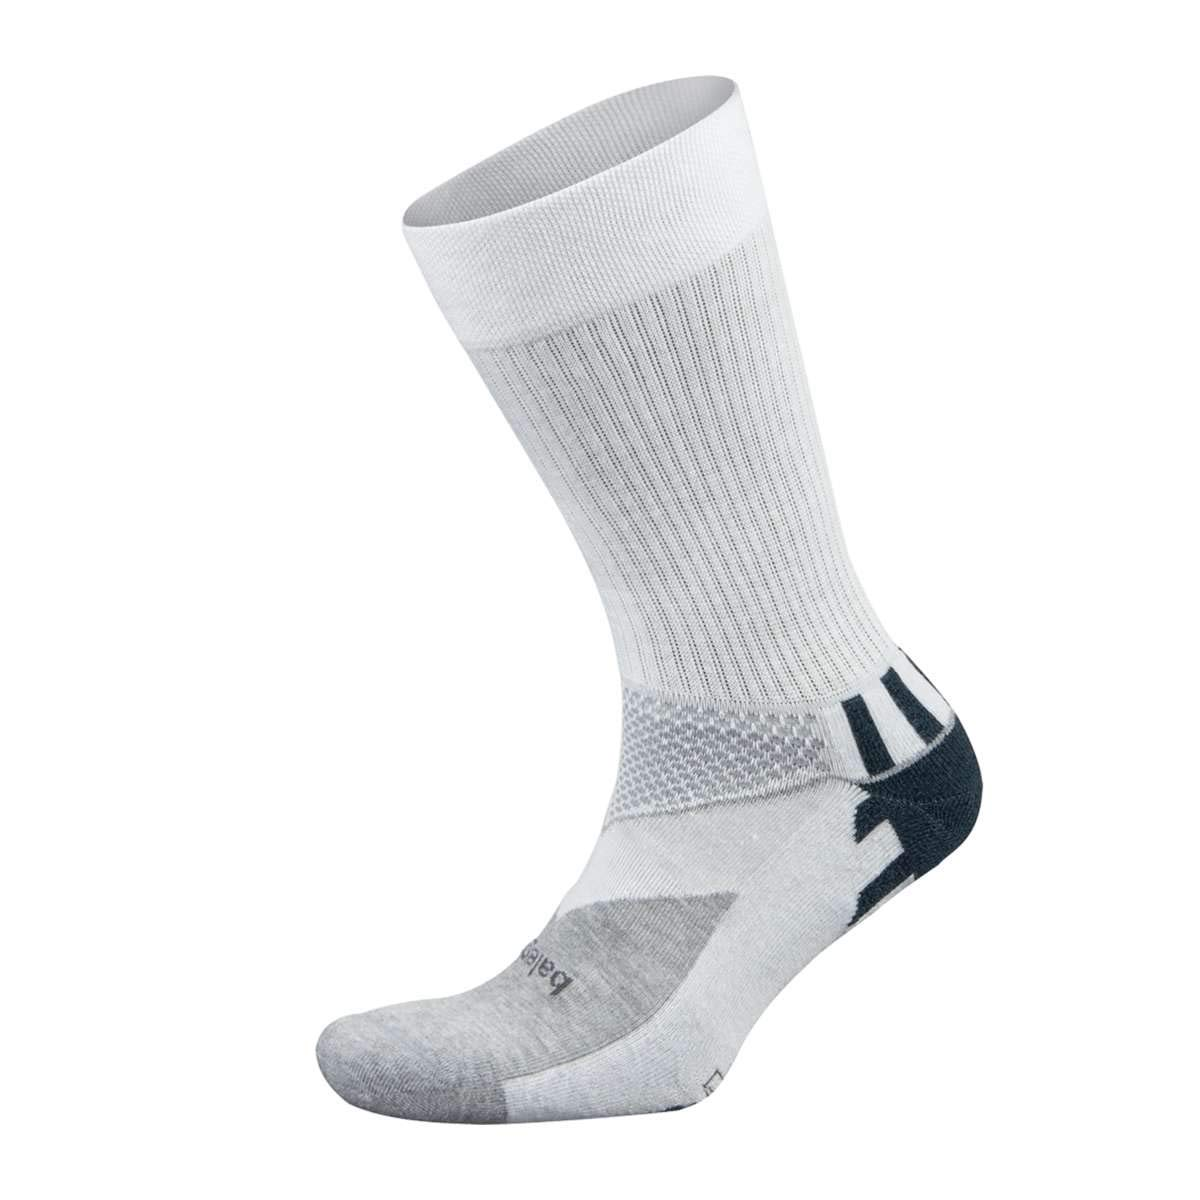 Balega Enduro V-Tech Crew Socks For Men and Women (1 Pair), White/Grey Heather, X-Large by Balega